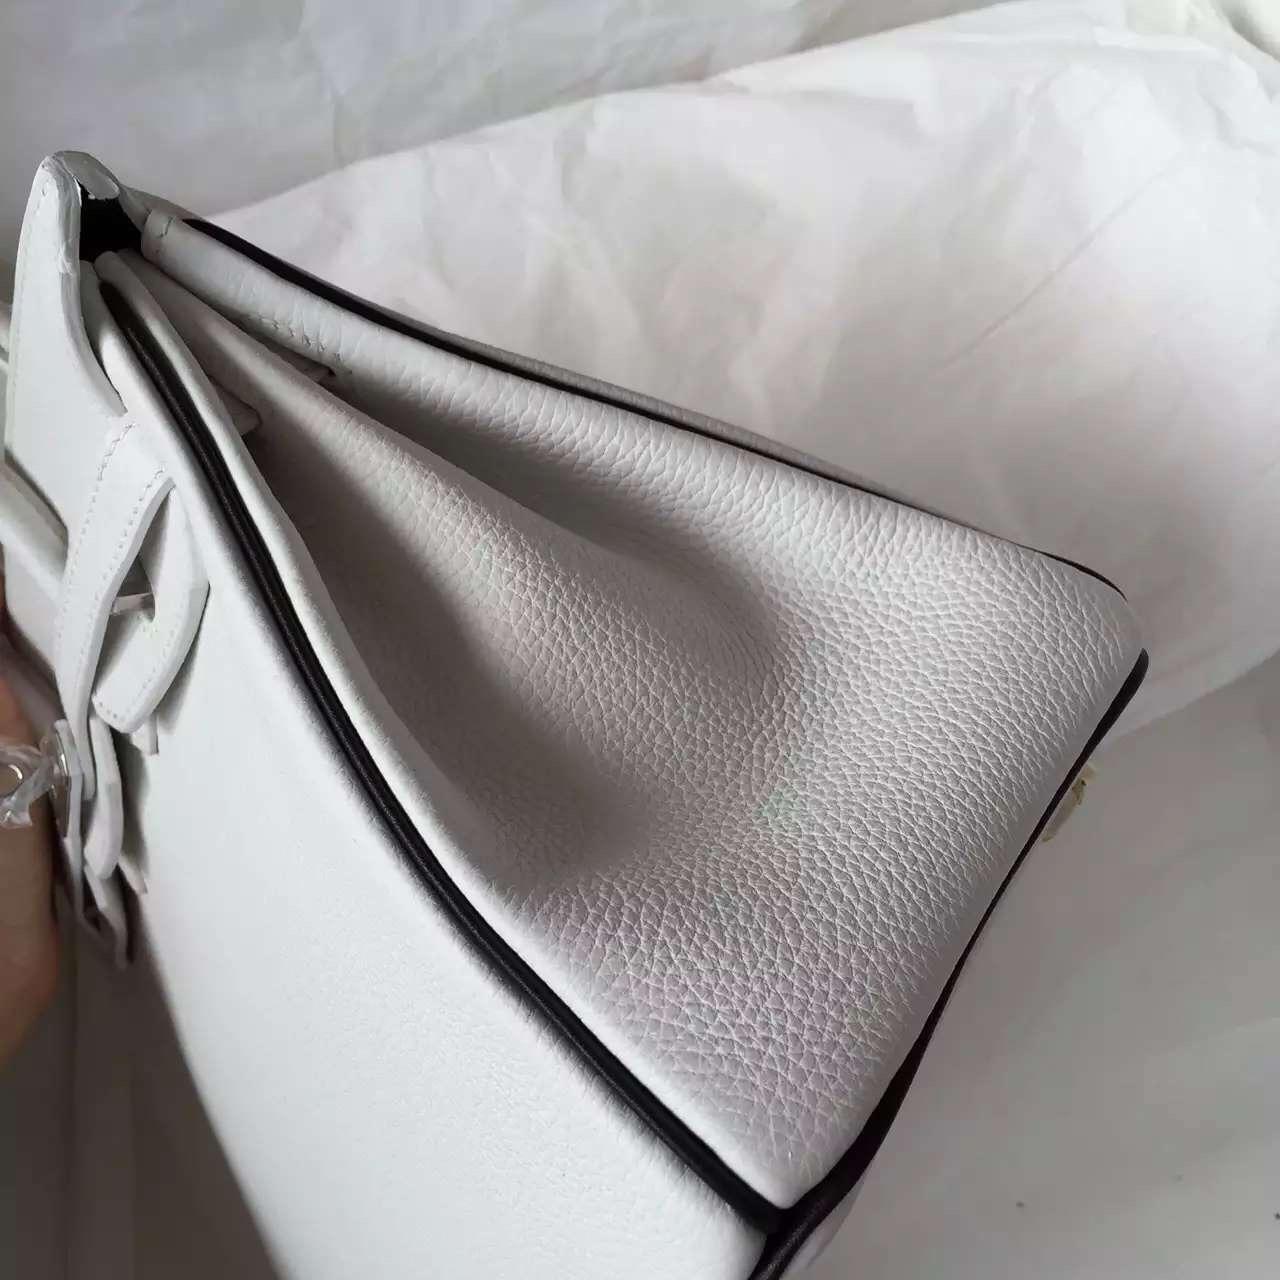 Luxury Hermes Birkin Bag White & Black Two-tone Color Togo Leather Women's Tote Bag 25CM